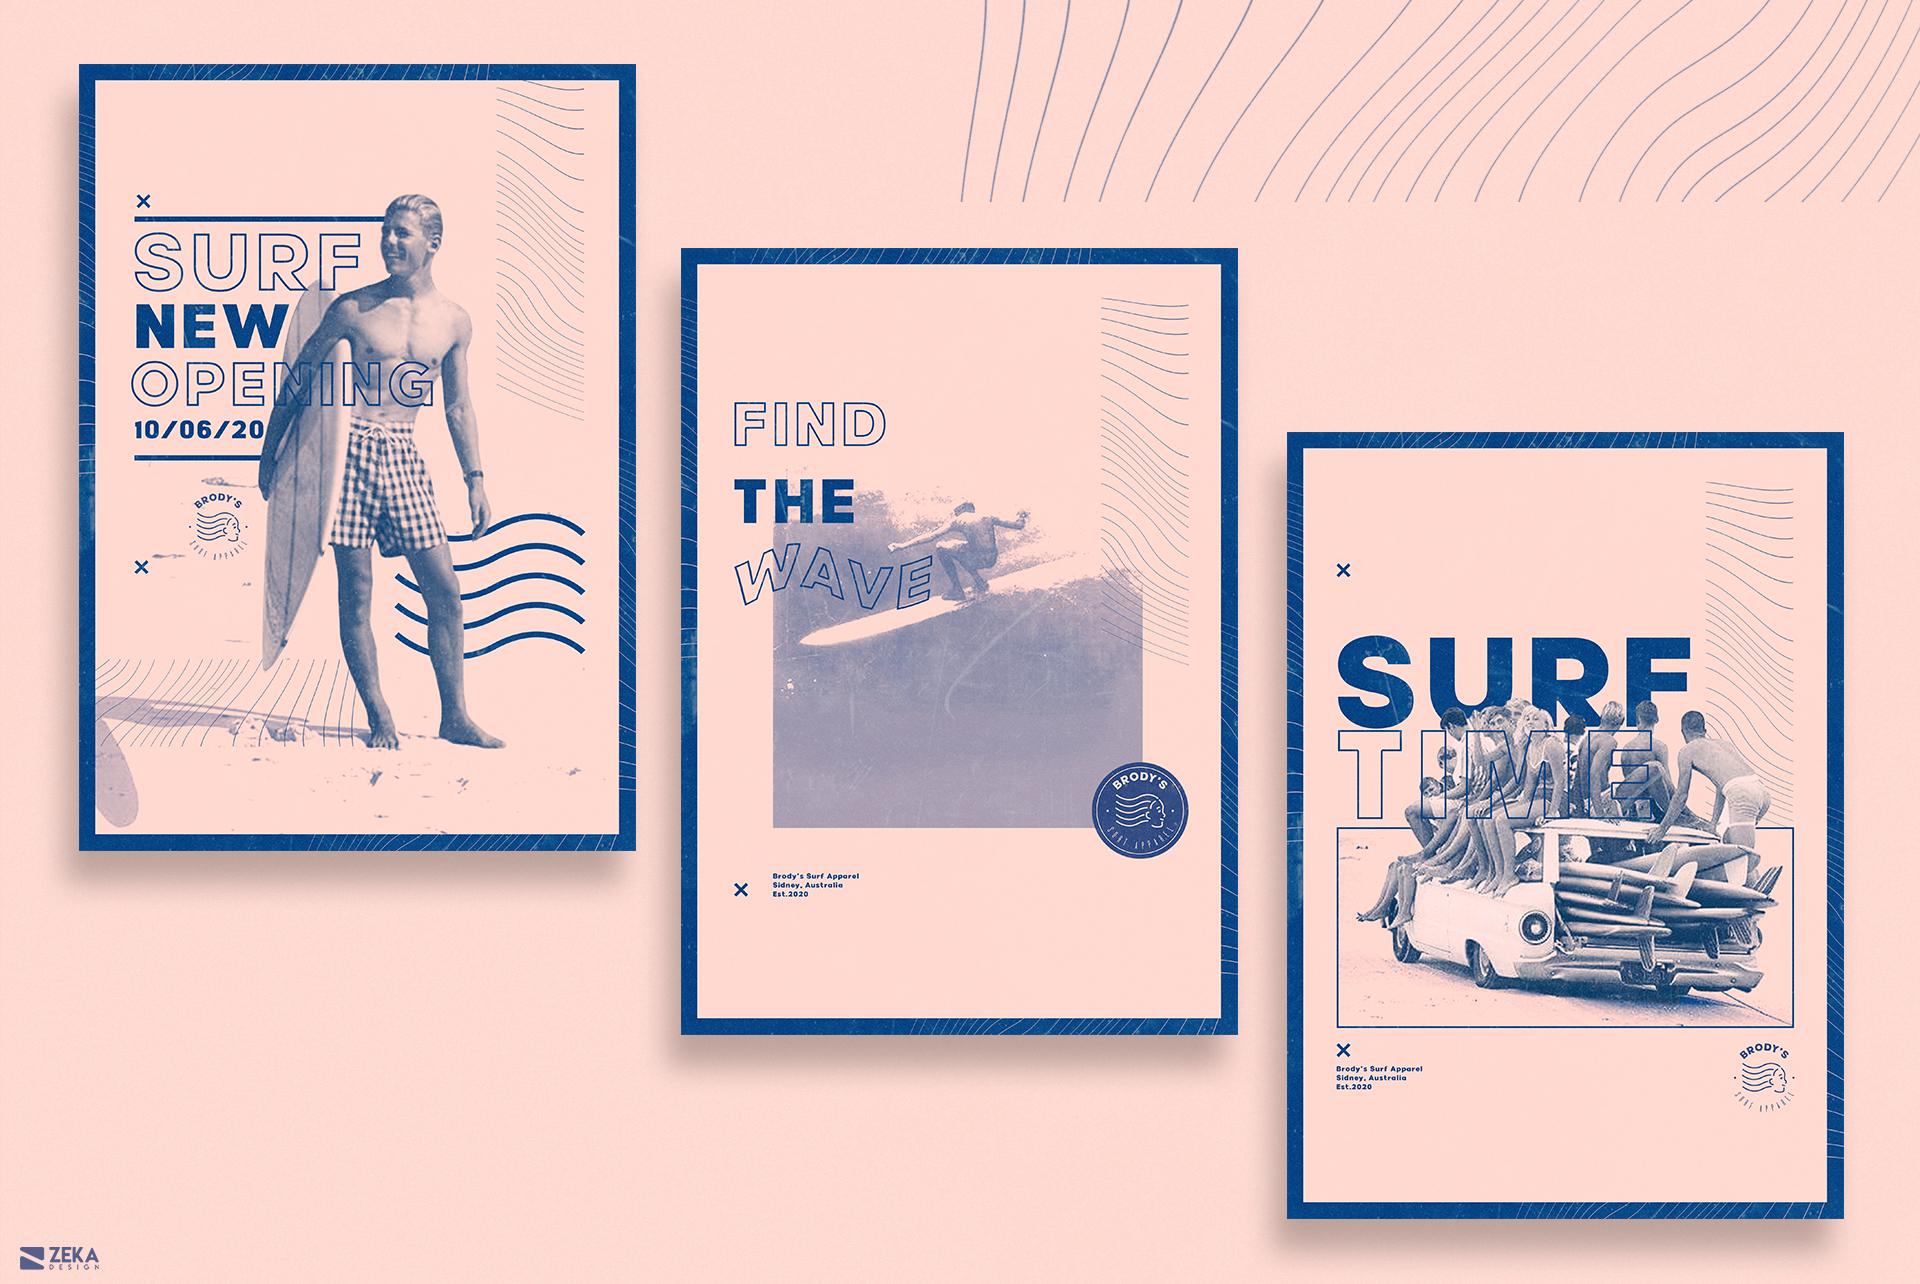 Brodys Surf Logo Design Brand Identity Design Concept by Zeka Design